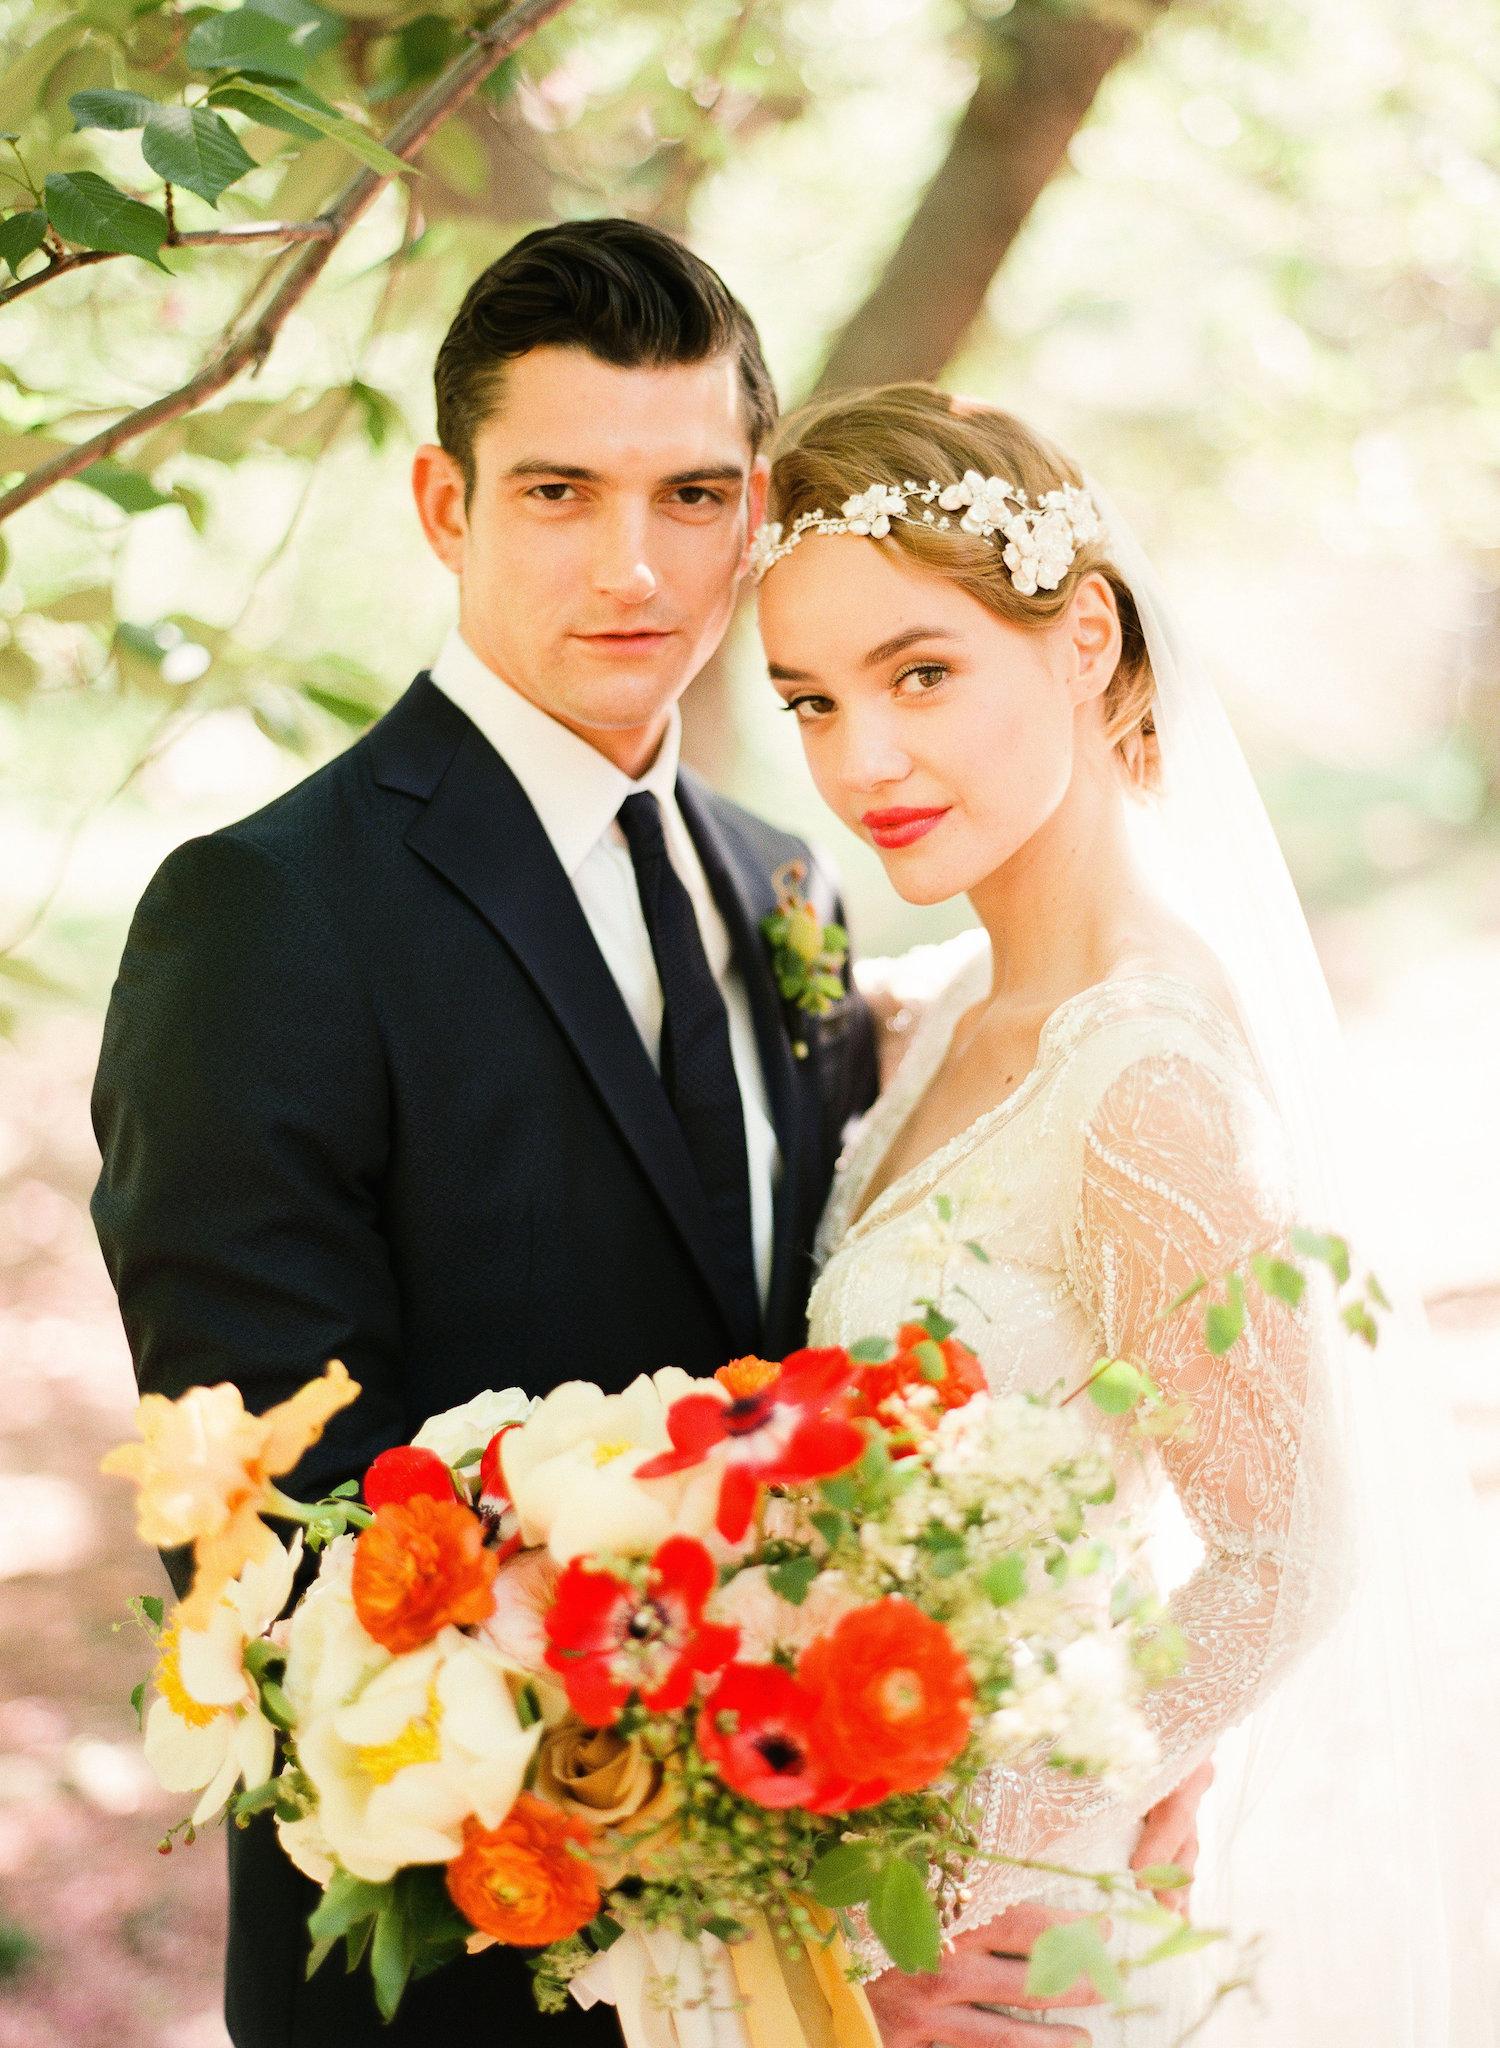 Morning Glow - Full Aperture Floral & Lindsay Madden Photography 6.jpeg